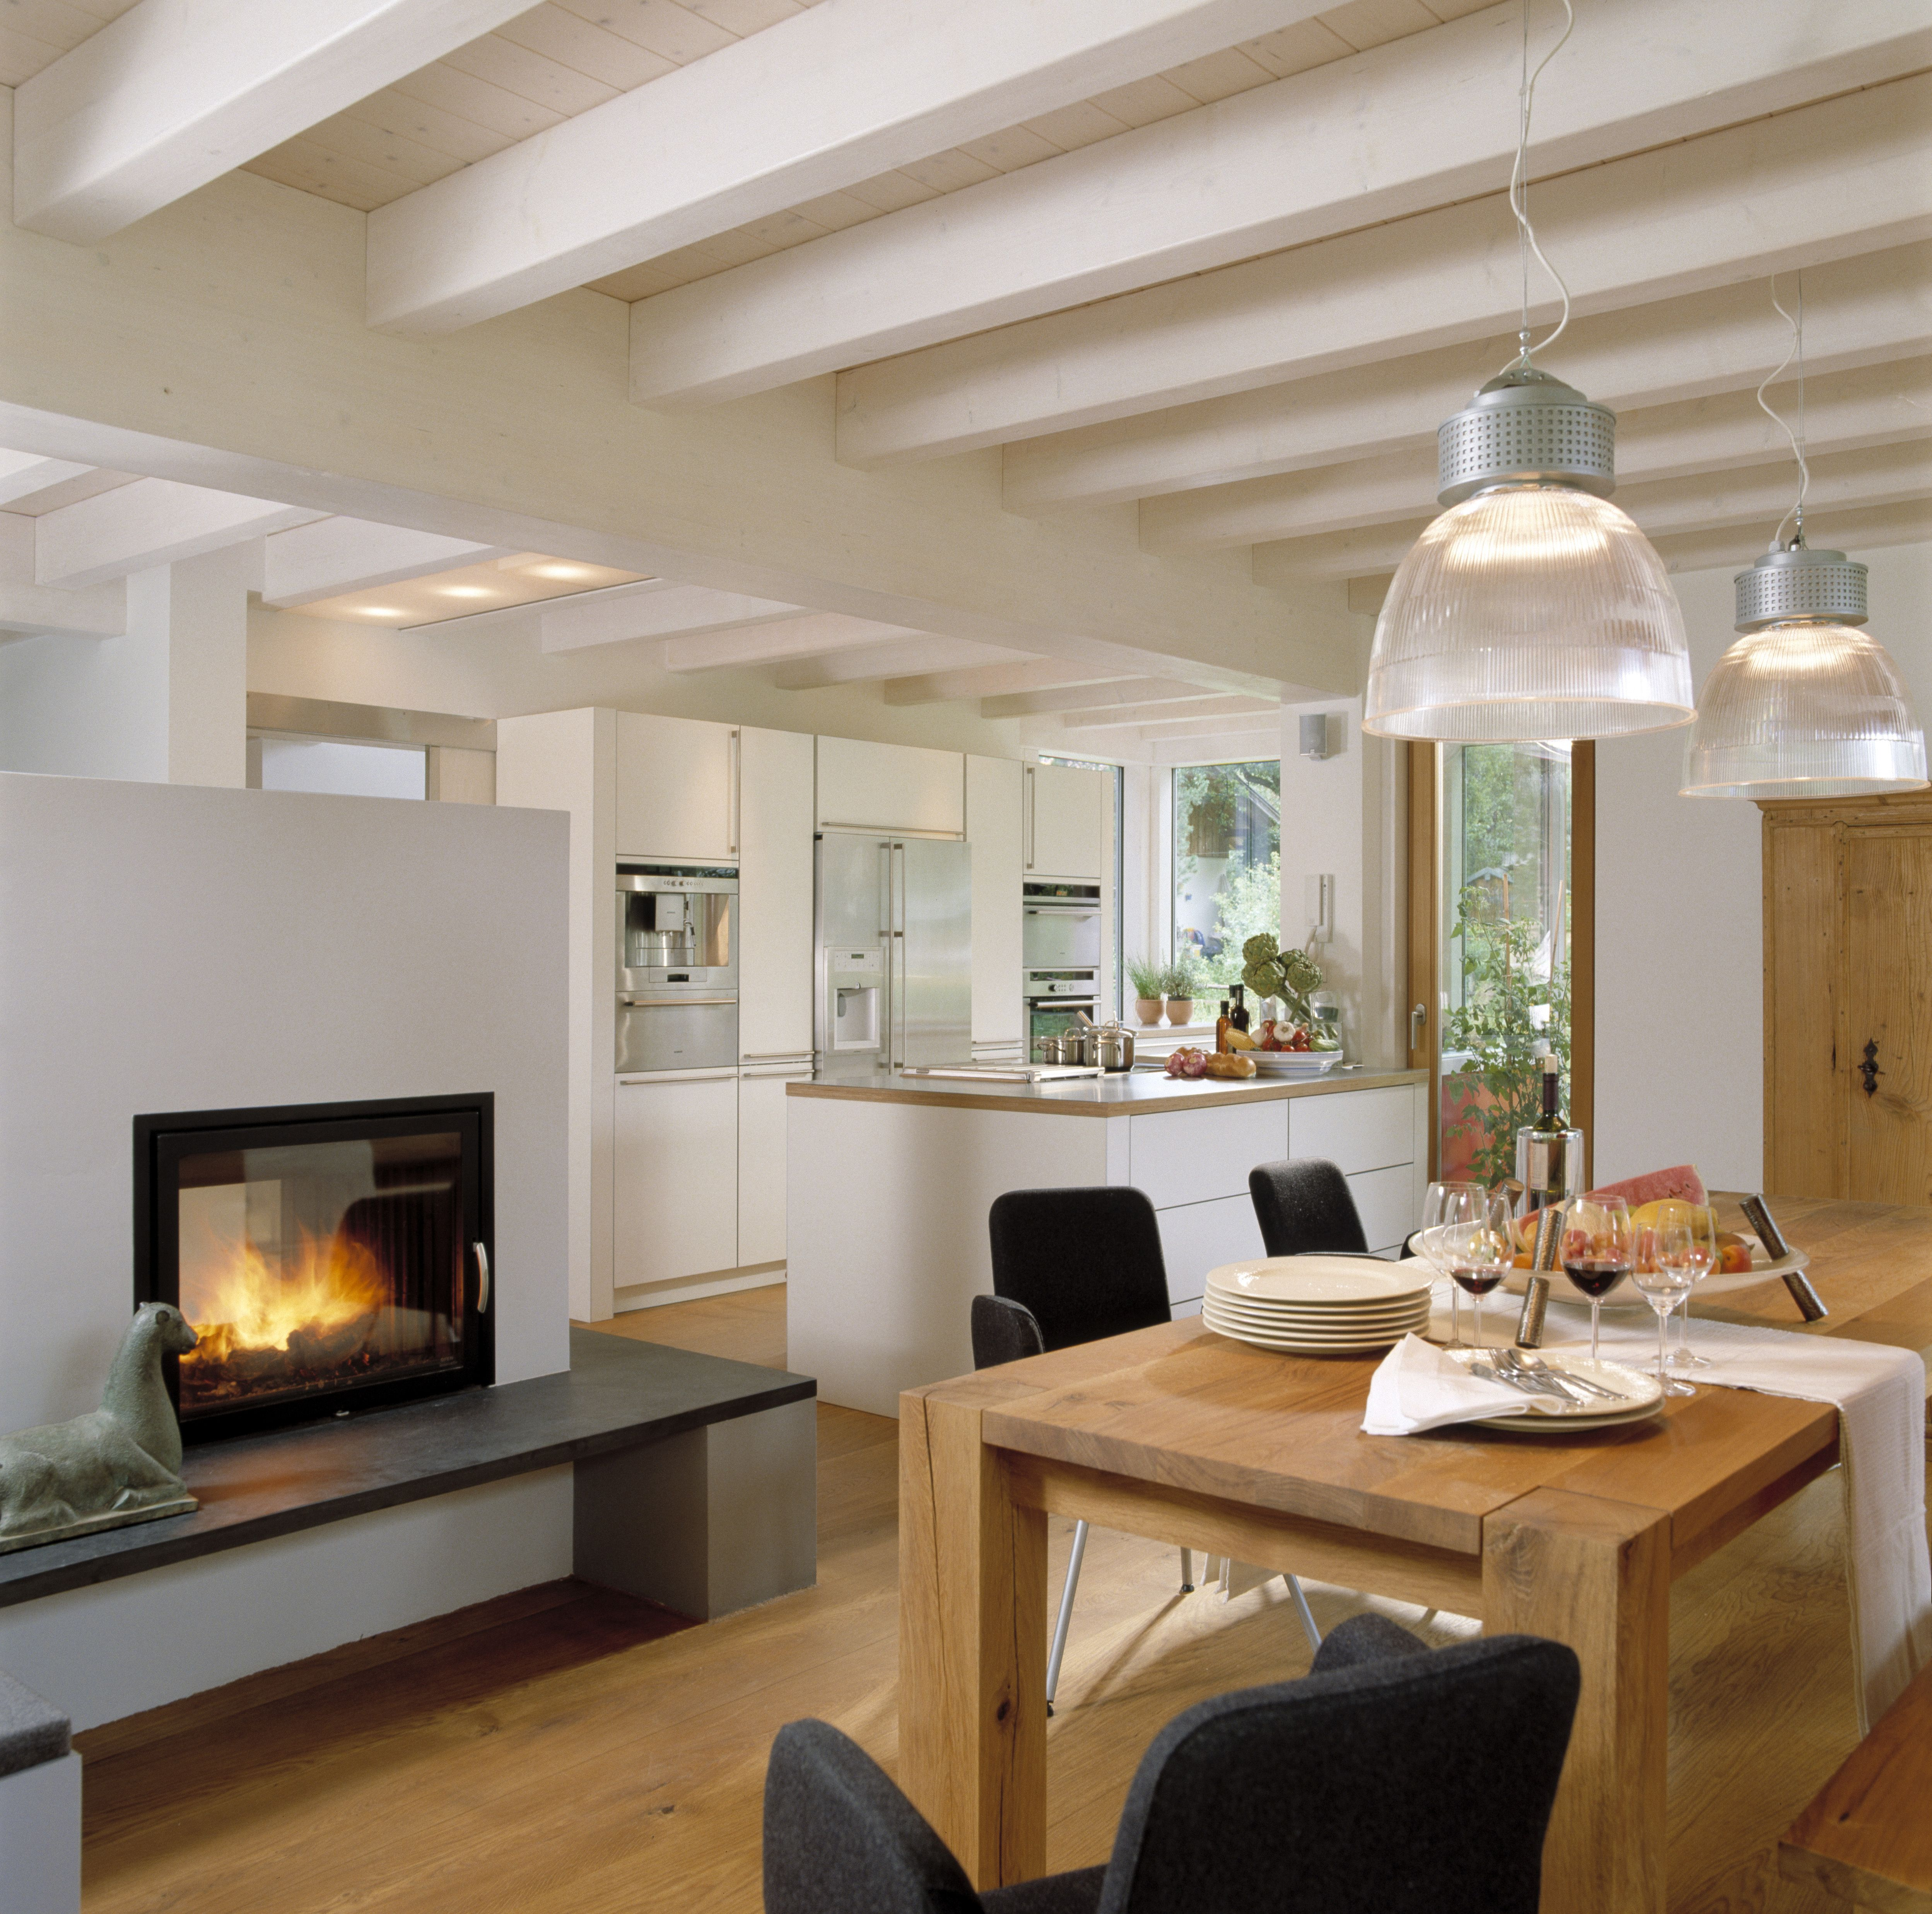 kaminofen-als-raumteiler-in-offener-küche.jpg 4.995×4.949 pixel ... - Kamin Als Trennwand